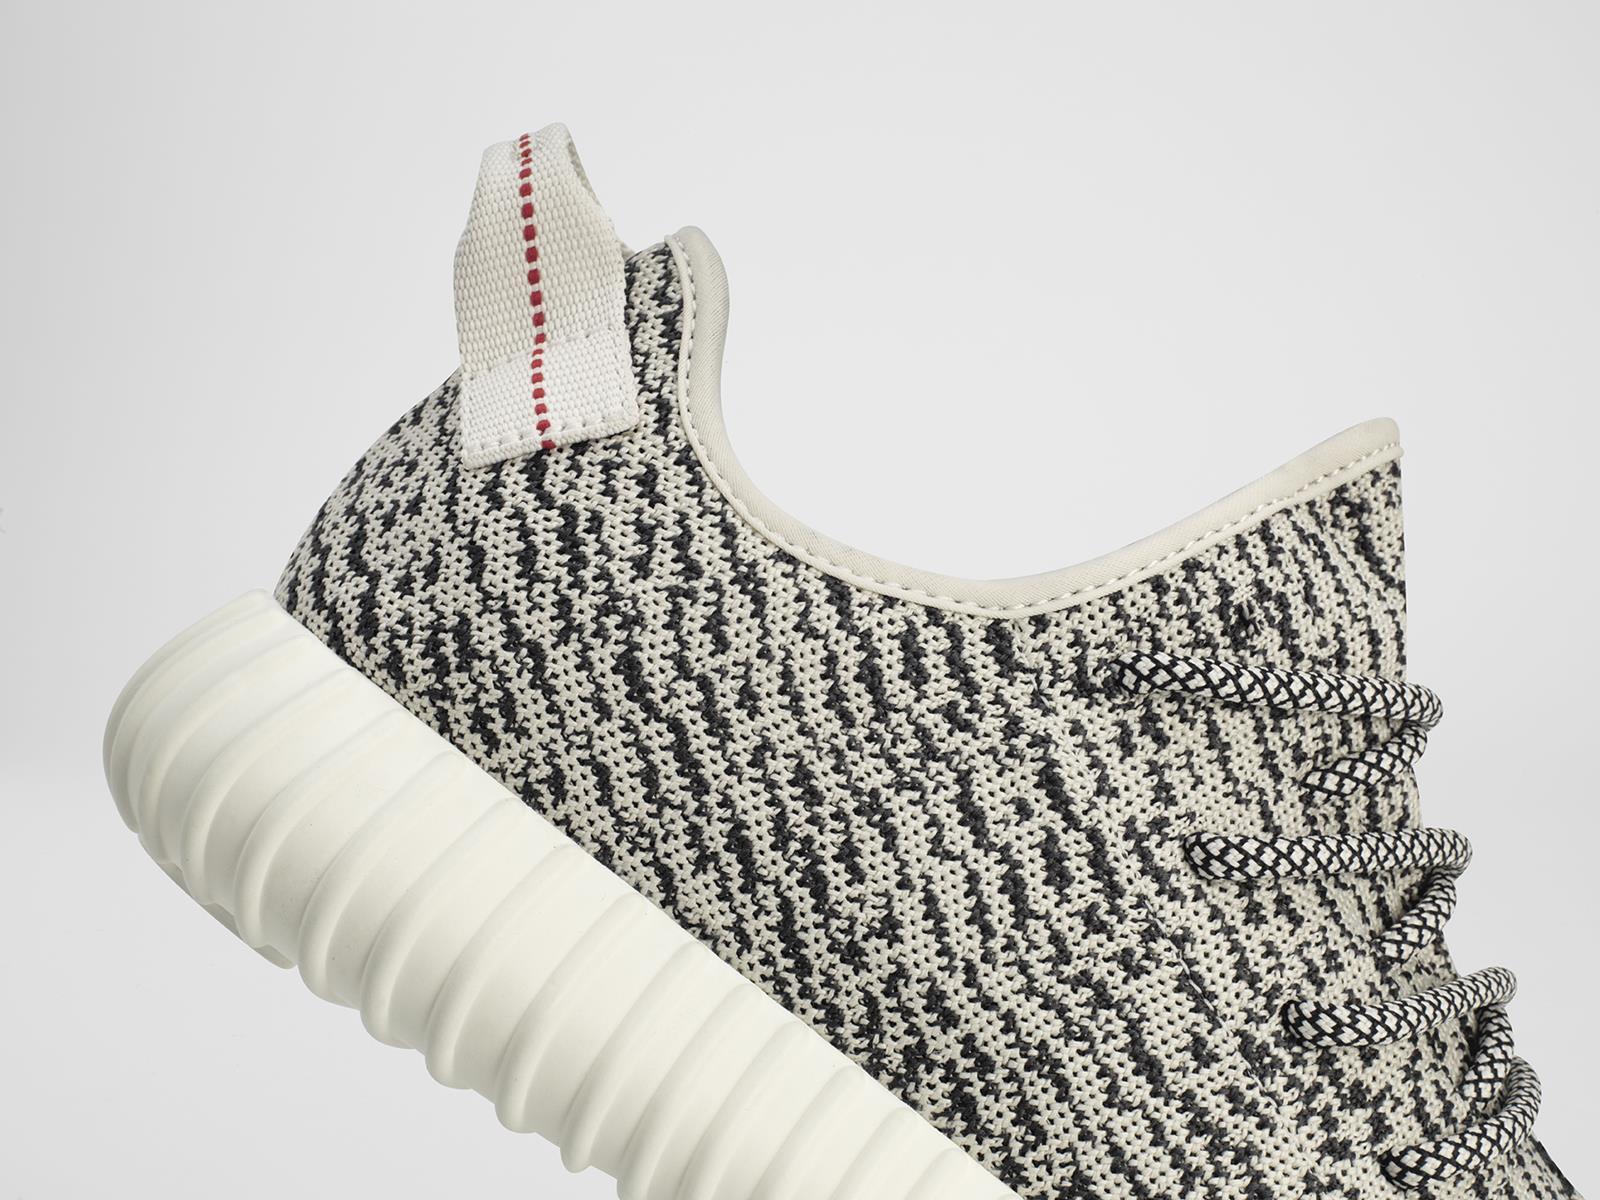 yeezy adidas scarpe